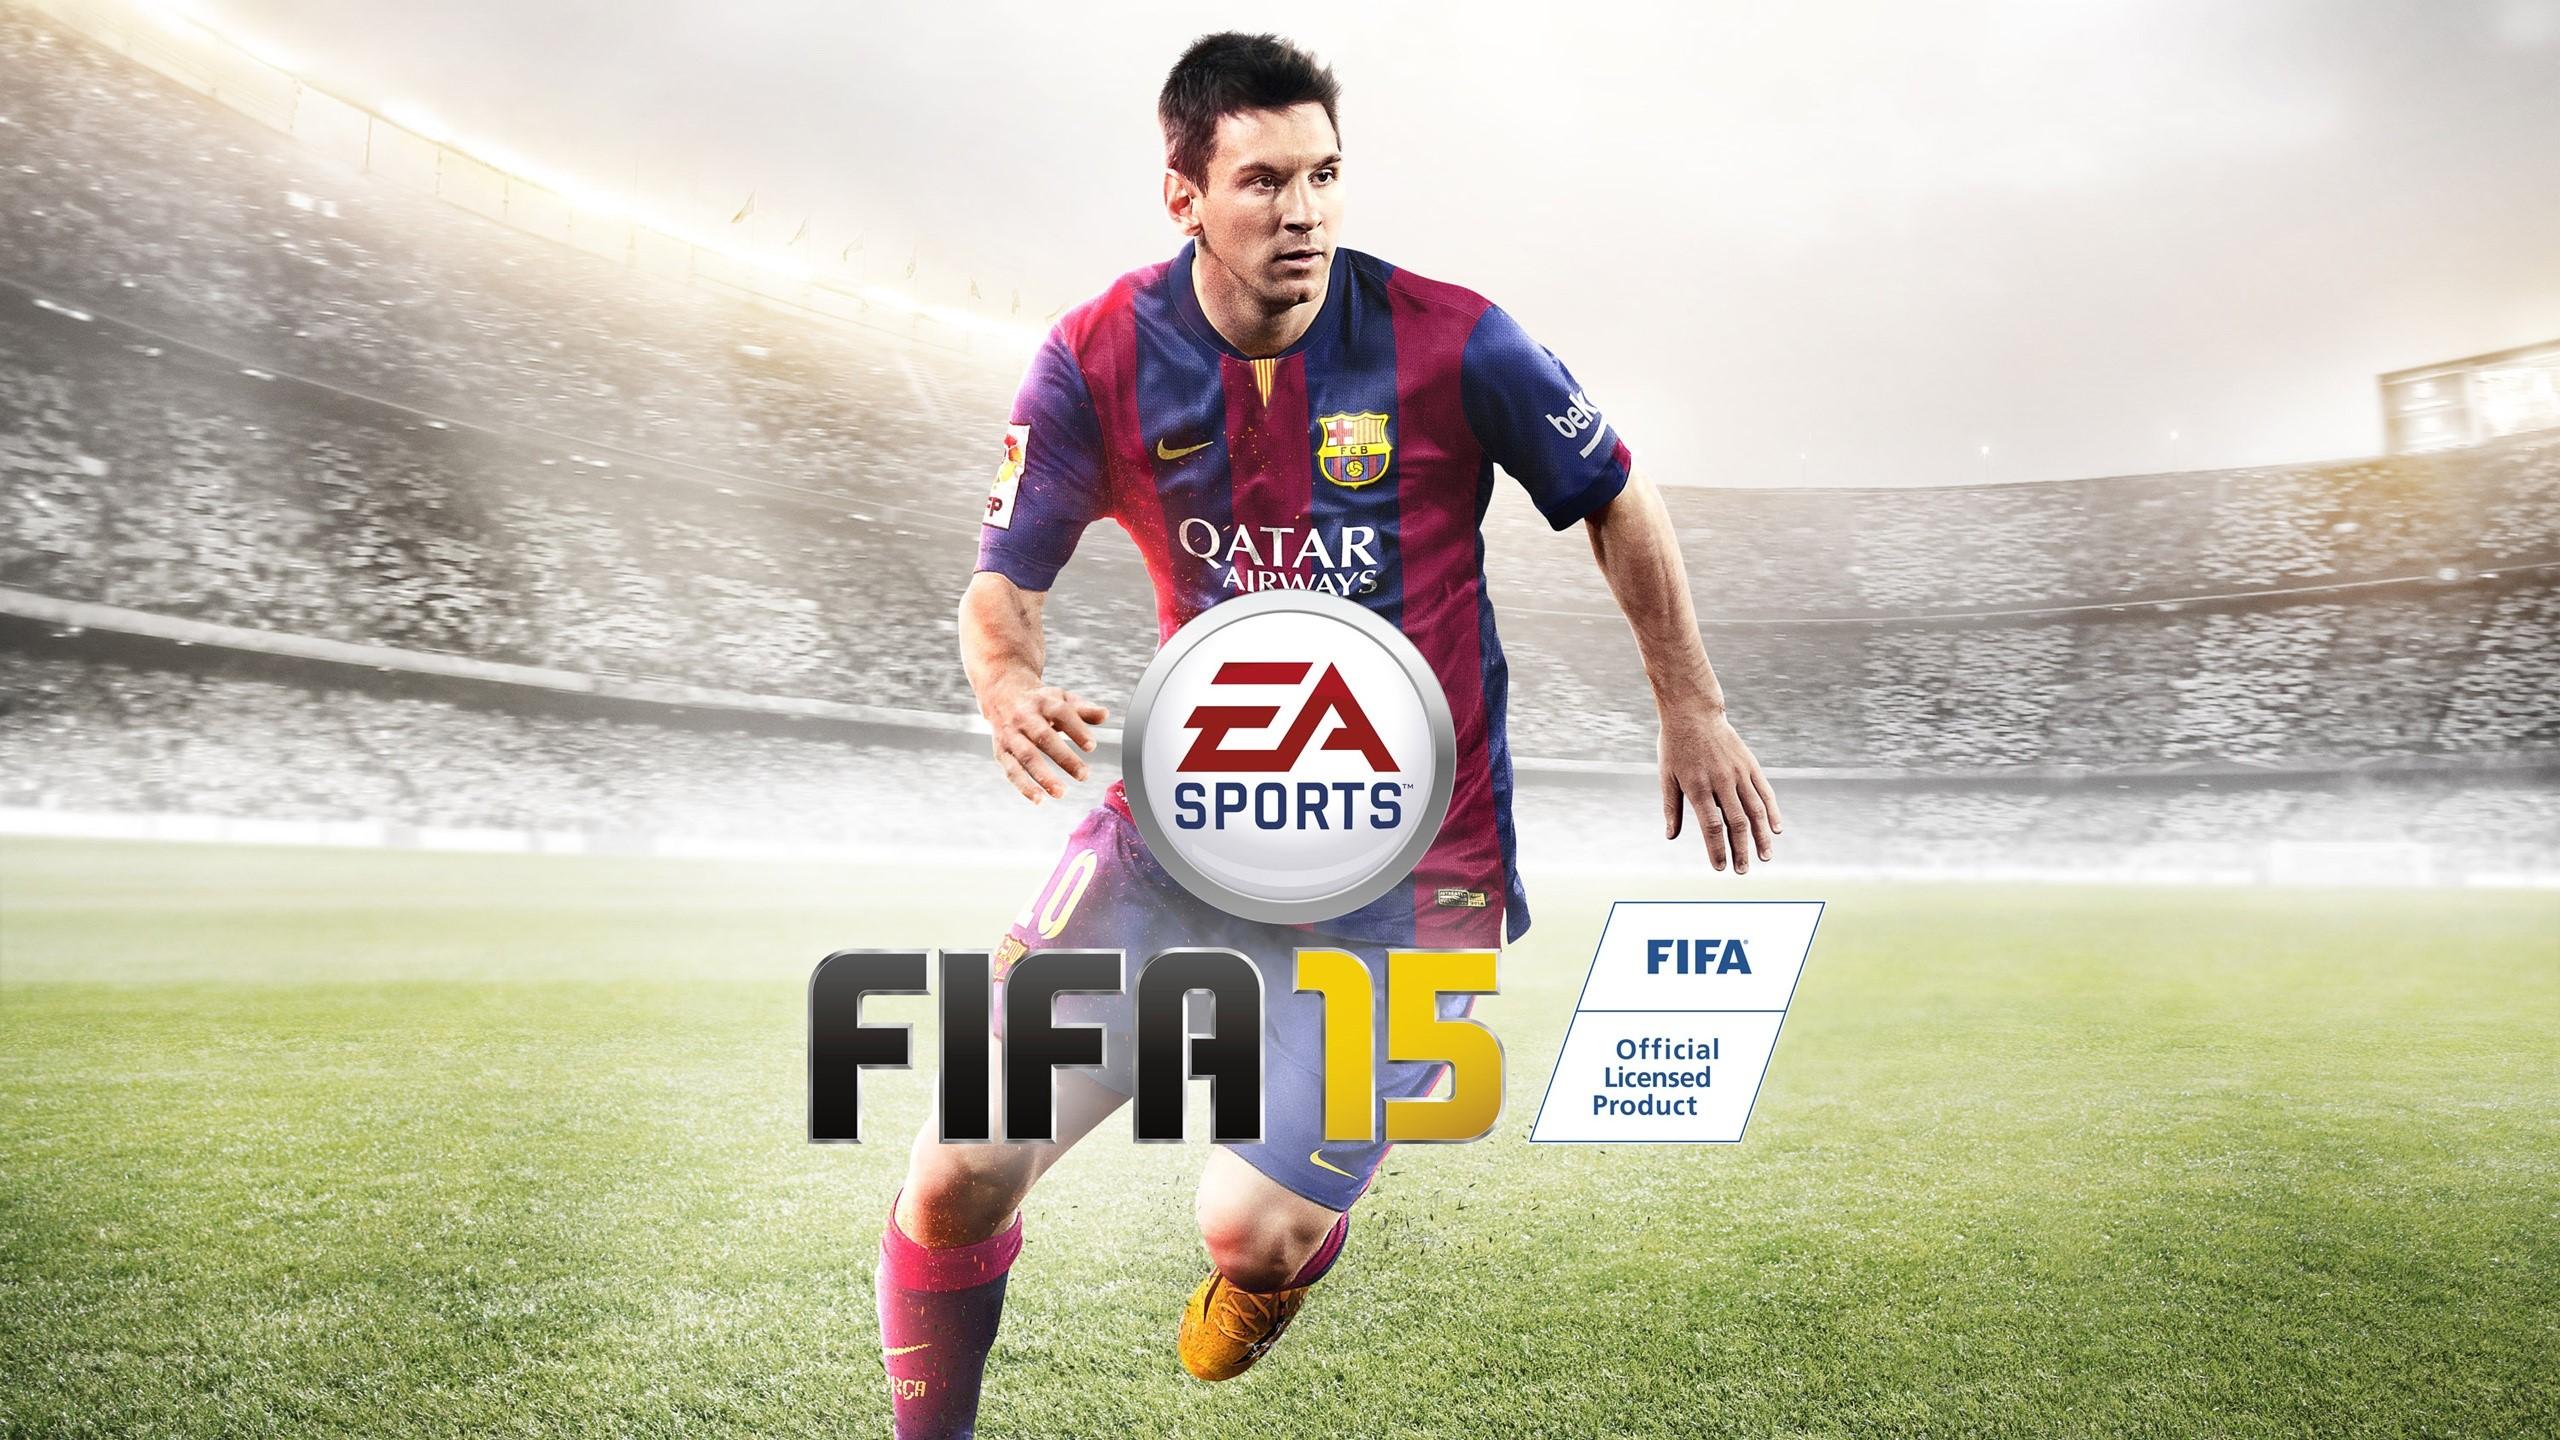 Fifa 15 | +Бонус + Подарок + Гарантия